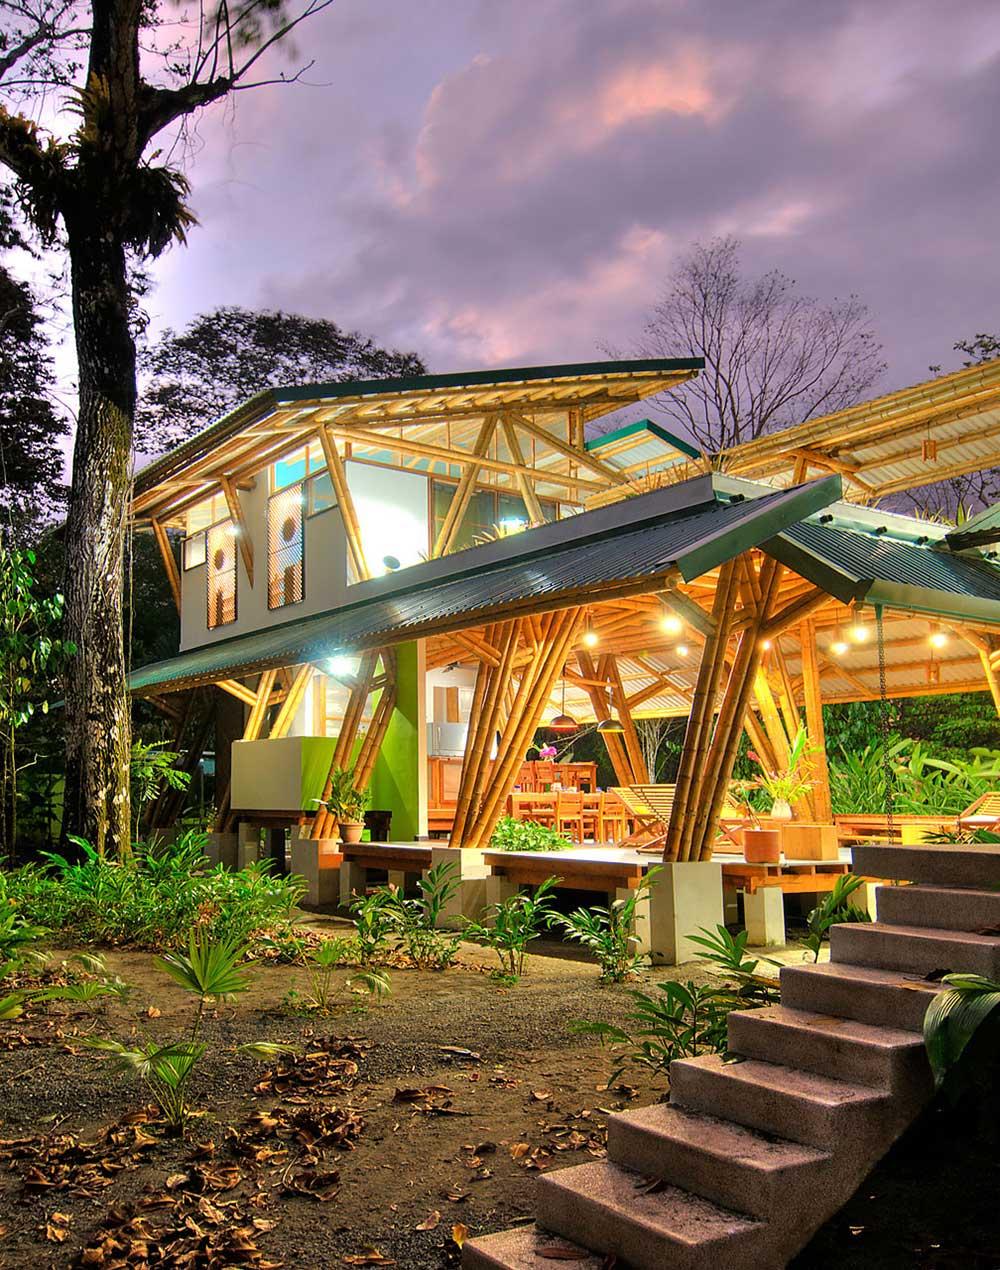 Lighting, Unique Beachfront Vacation Home in Costa Rica